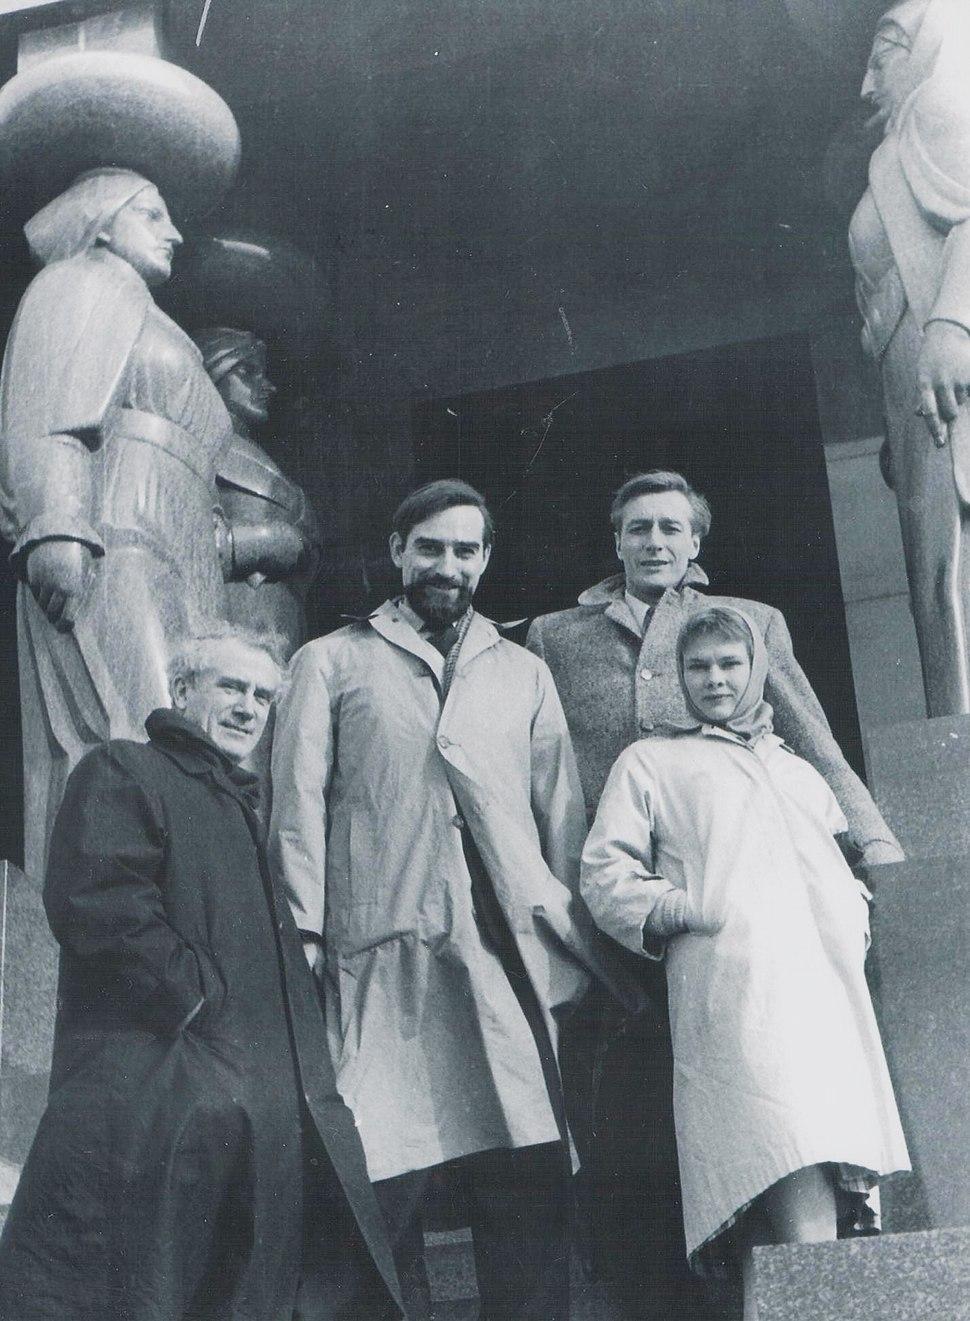 Stevan Kragujevic, Laurence Olivier, Judi Dench, John Neville and Joseph O'Conor in Belgrade